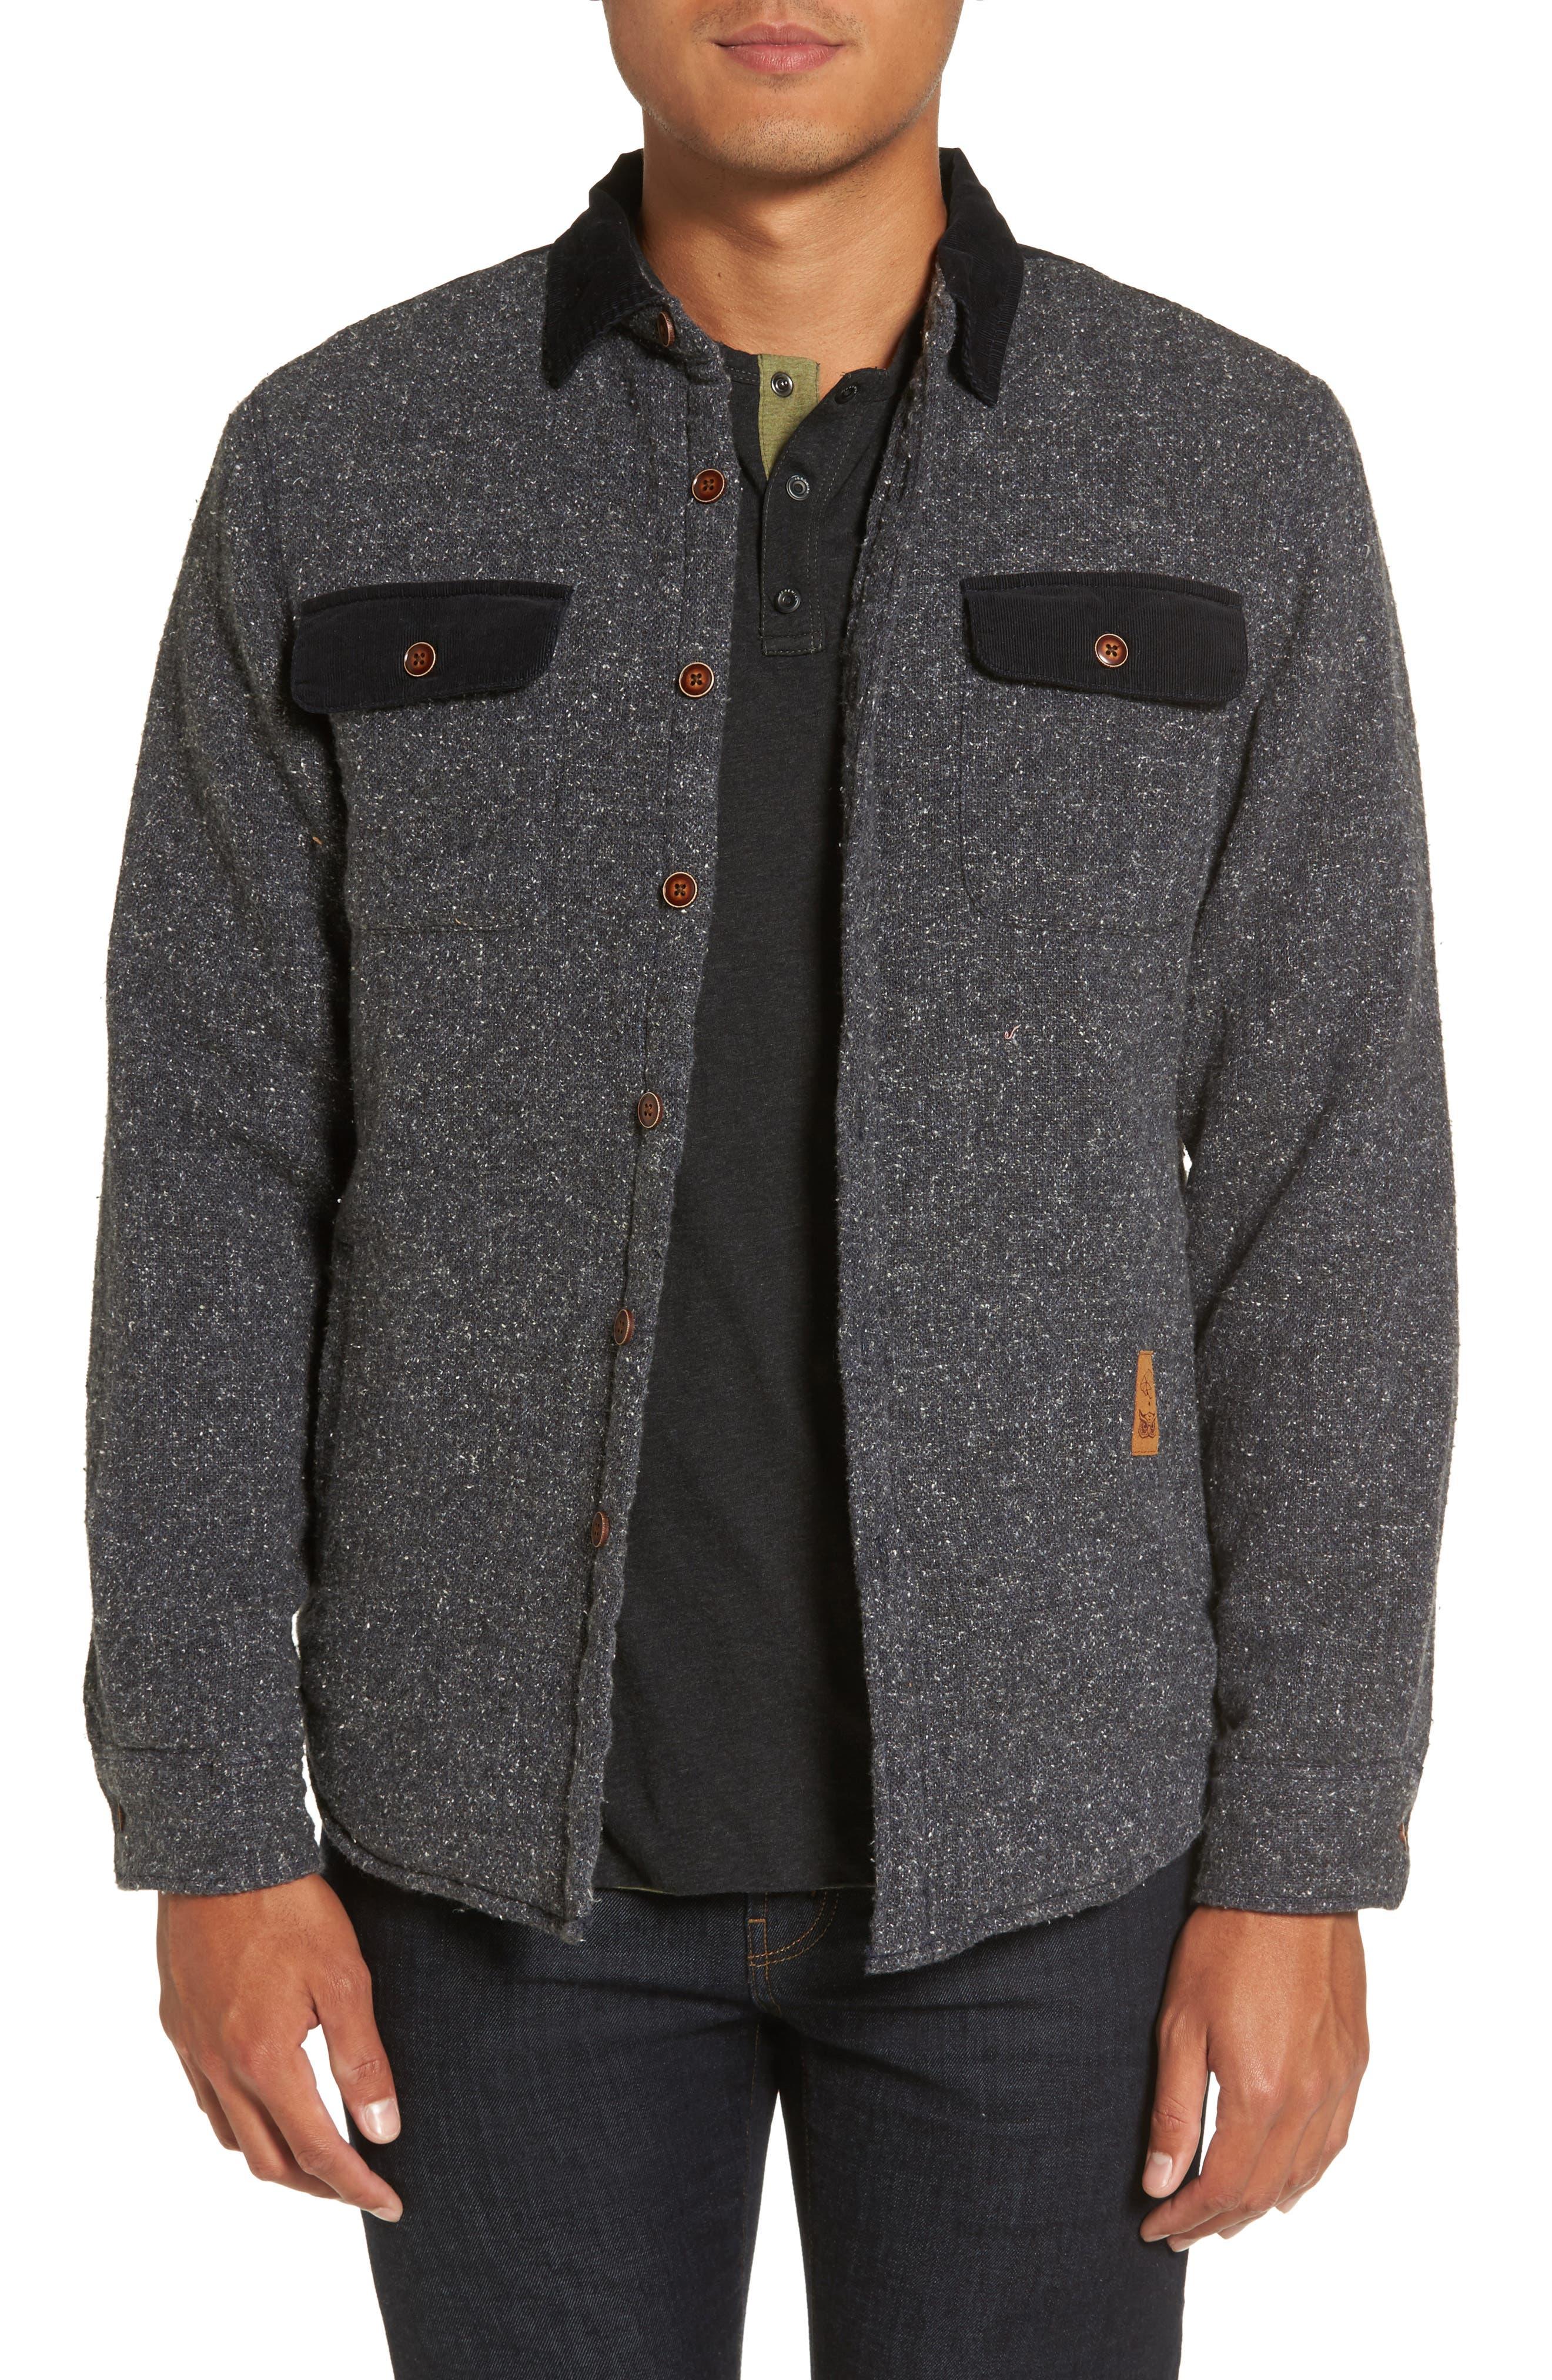 Alternate Image 1 Selected - Nifty Genius CPO Shirt Jacket